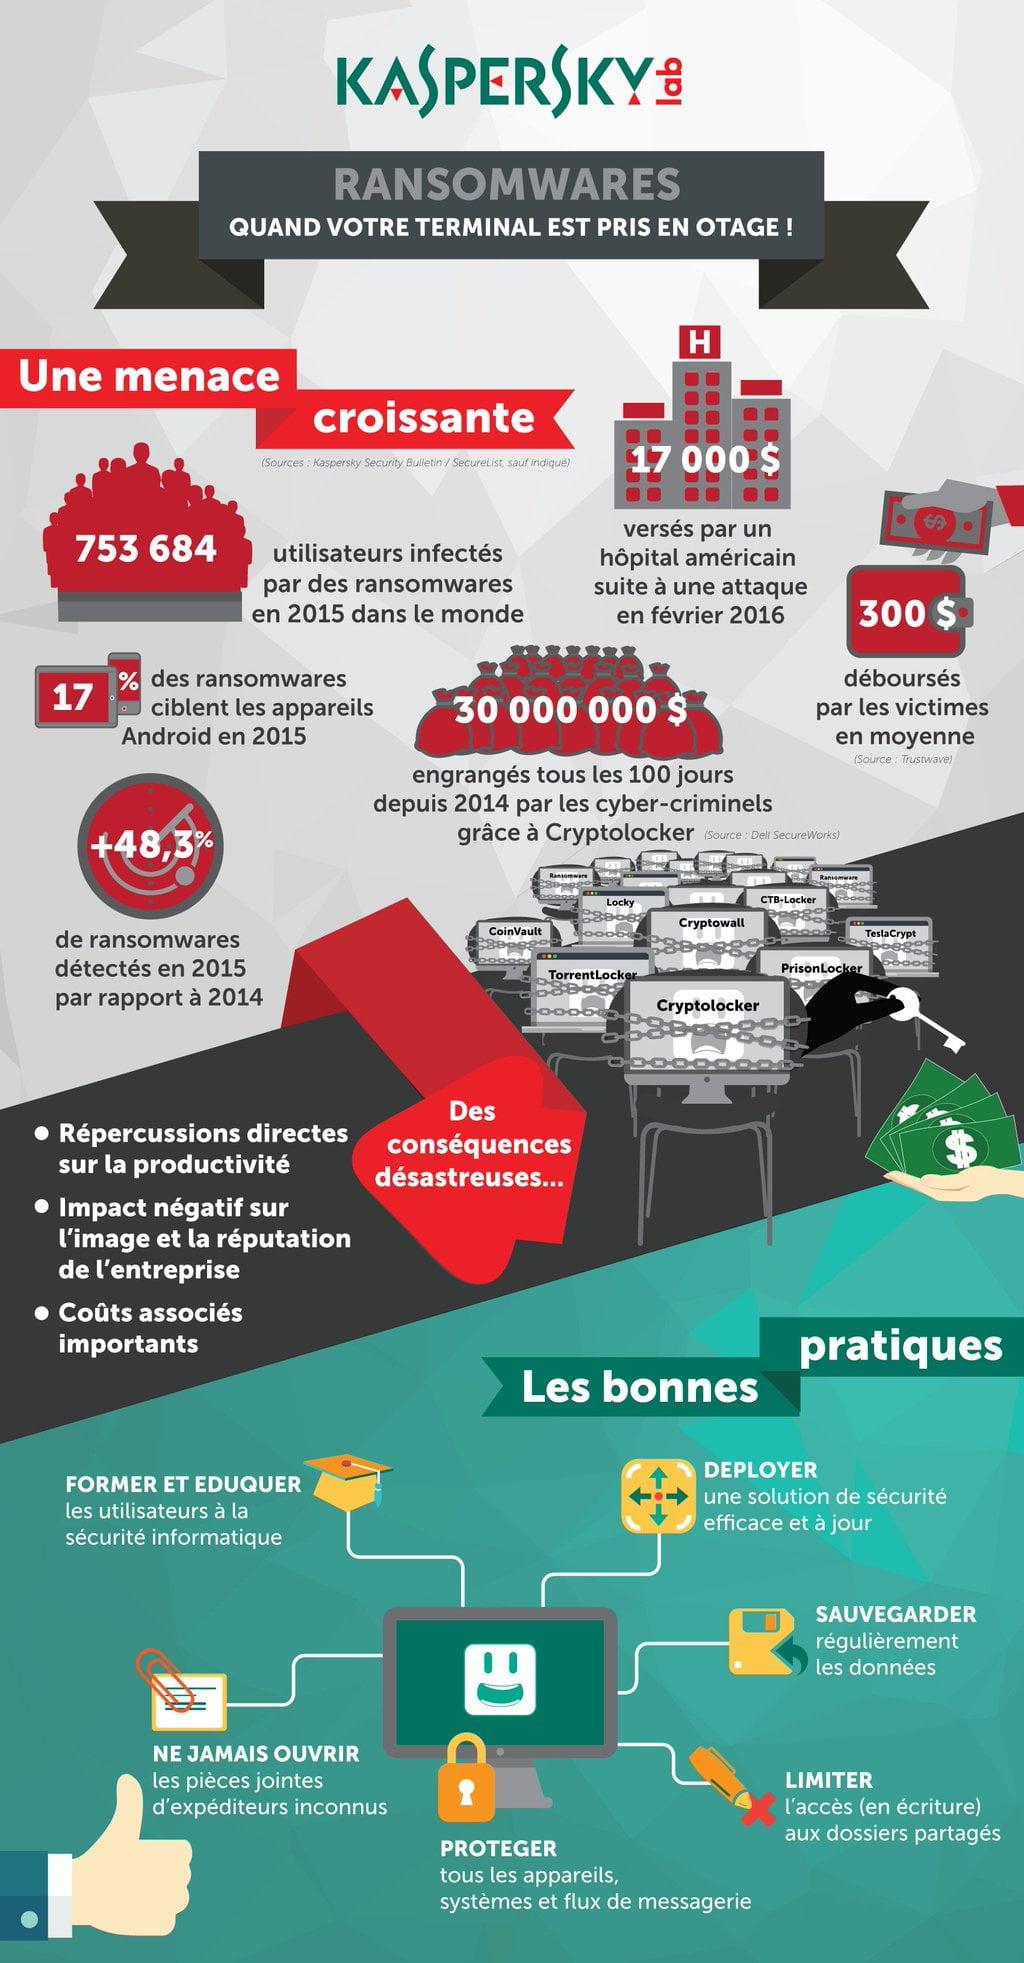 ransomware-infographie-kaspersky